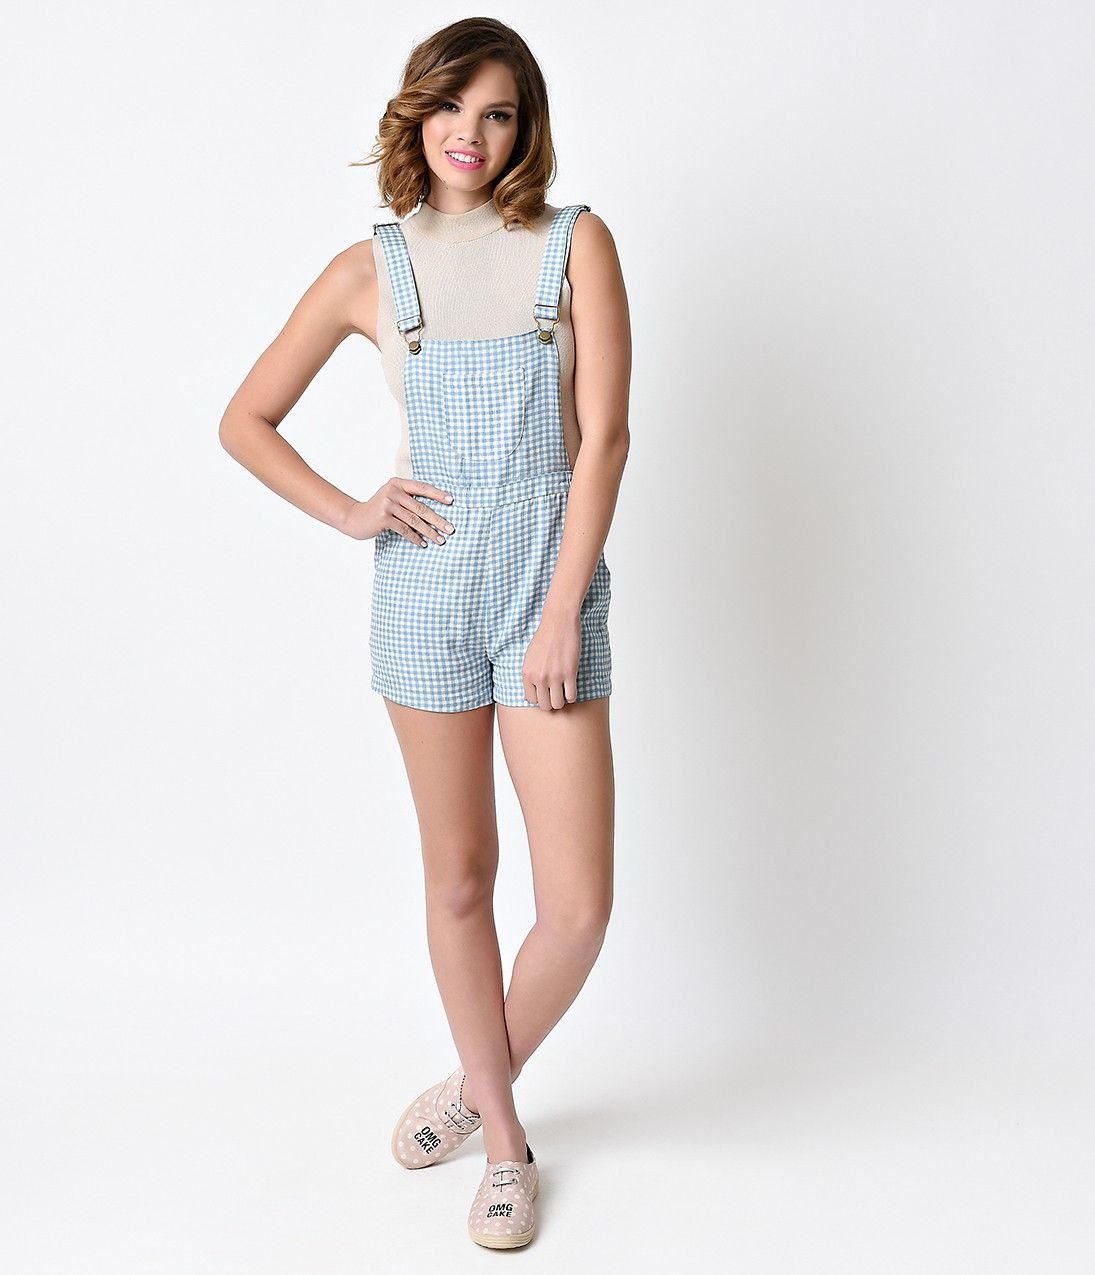 Retro Style Sky Blue & White Gingham Suspender Overall Shorts